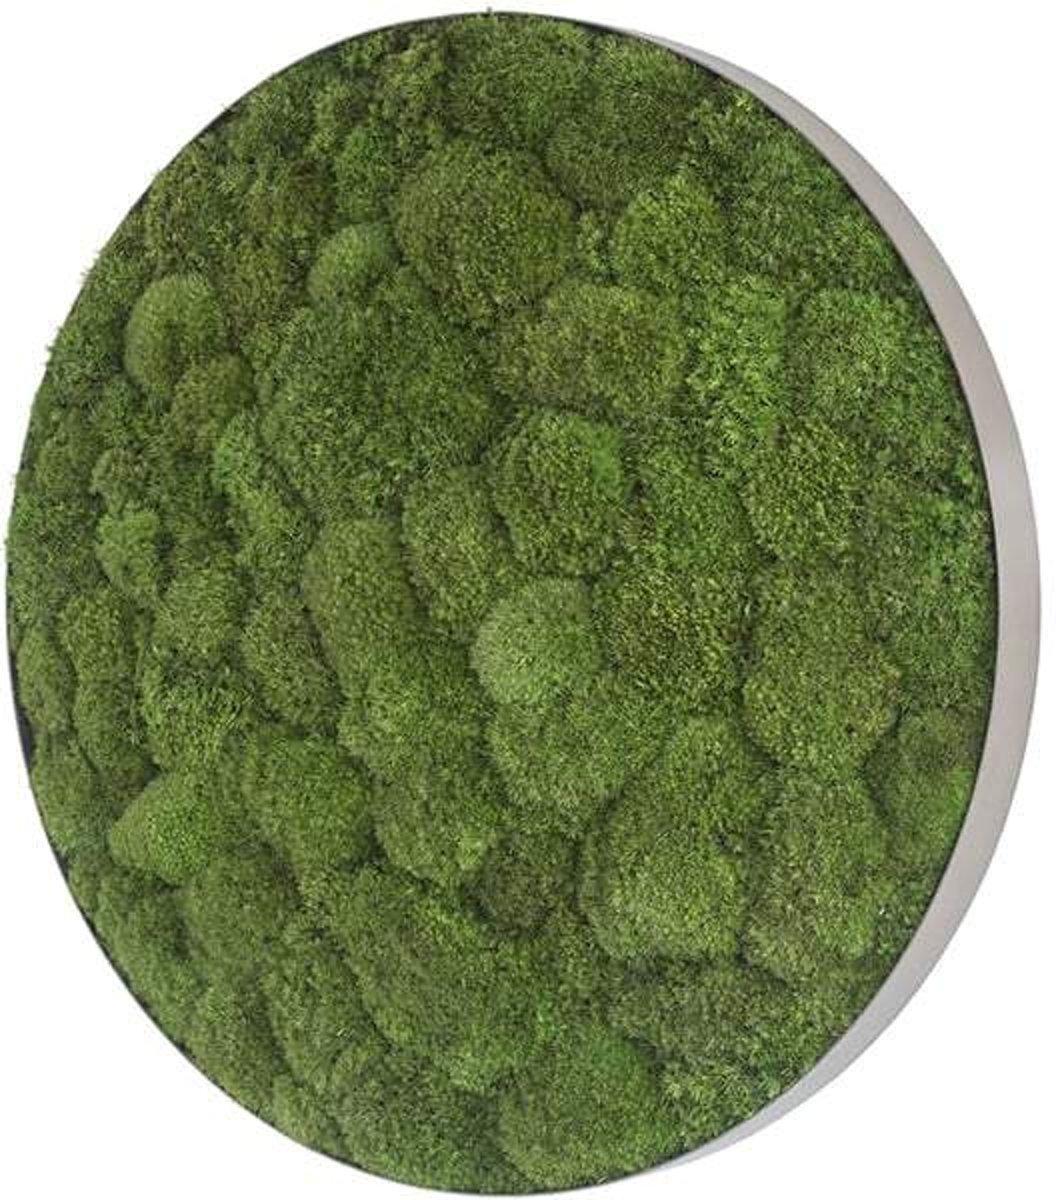 Ronde verticale tuin - Pole moss - Ellipsoid - Diameter 54cm